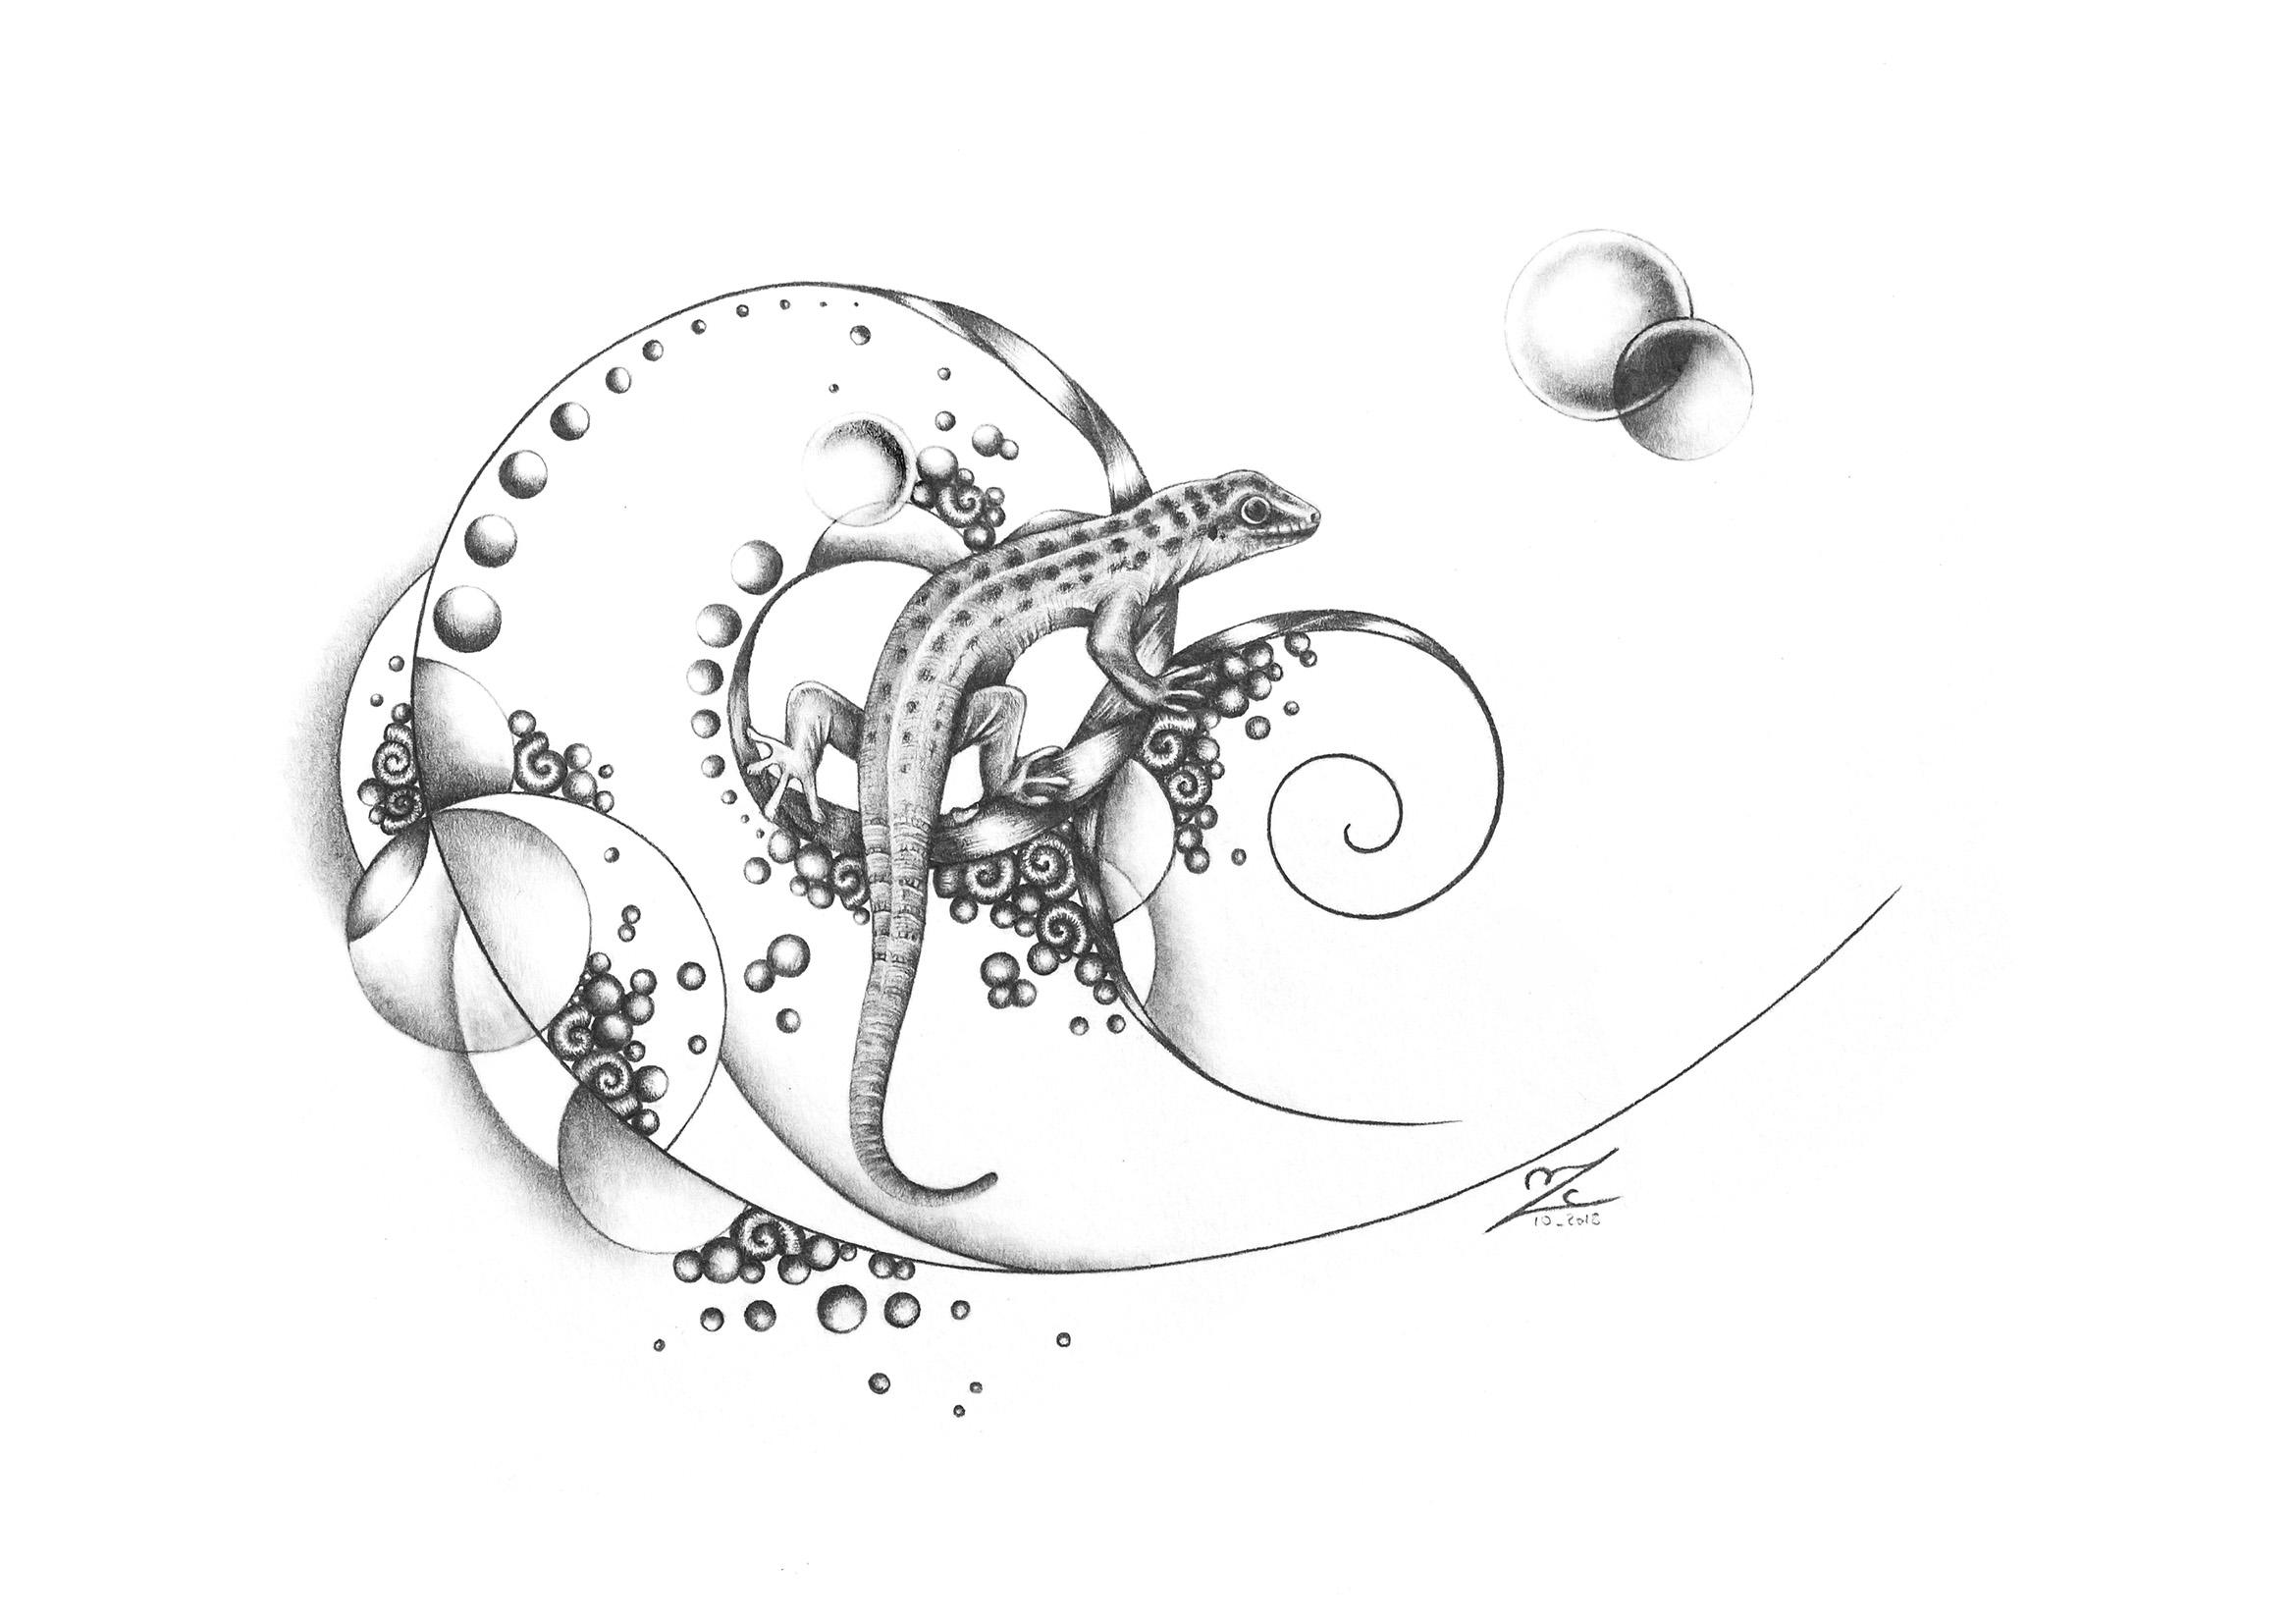 Garden Soul - Phelsuma cepediana